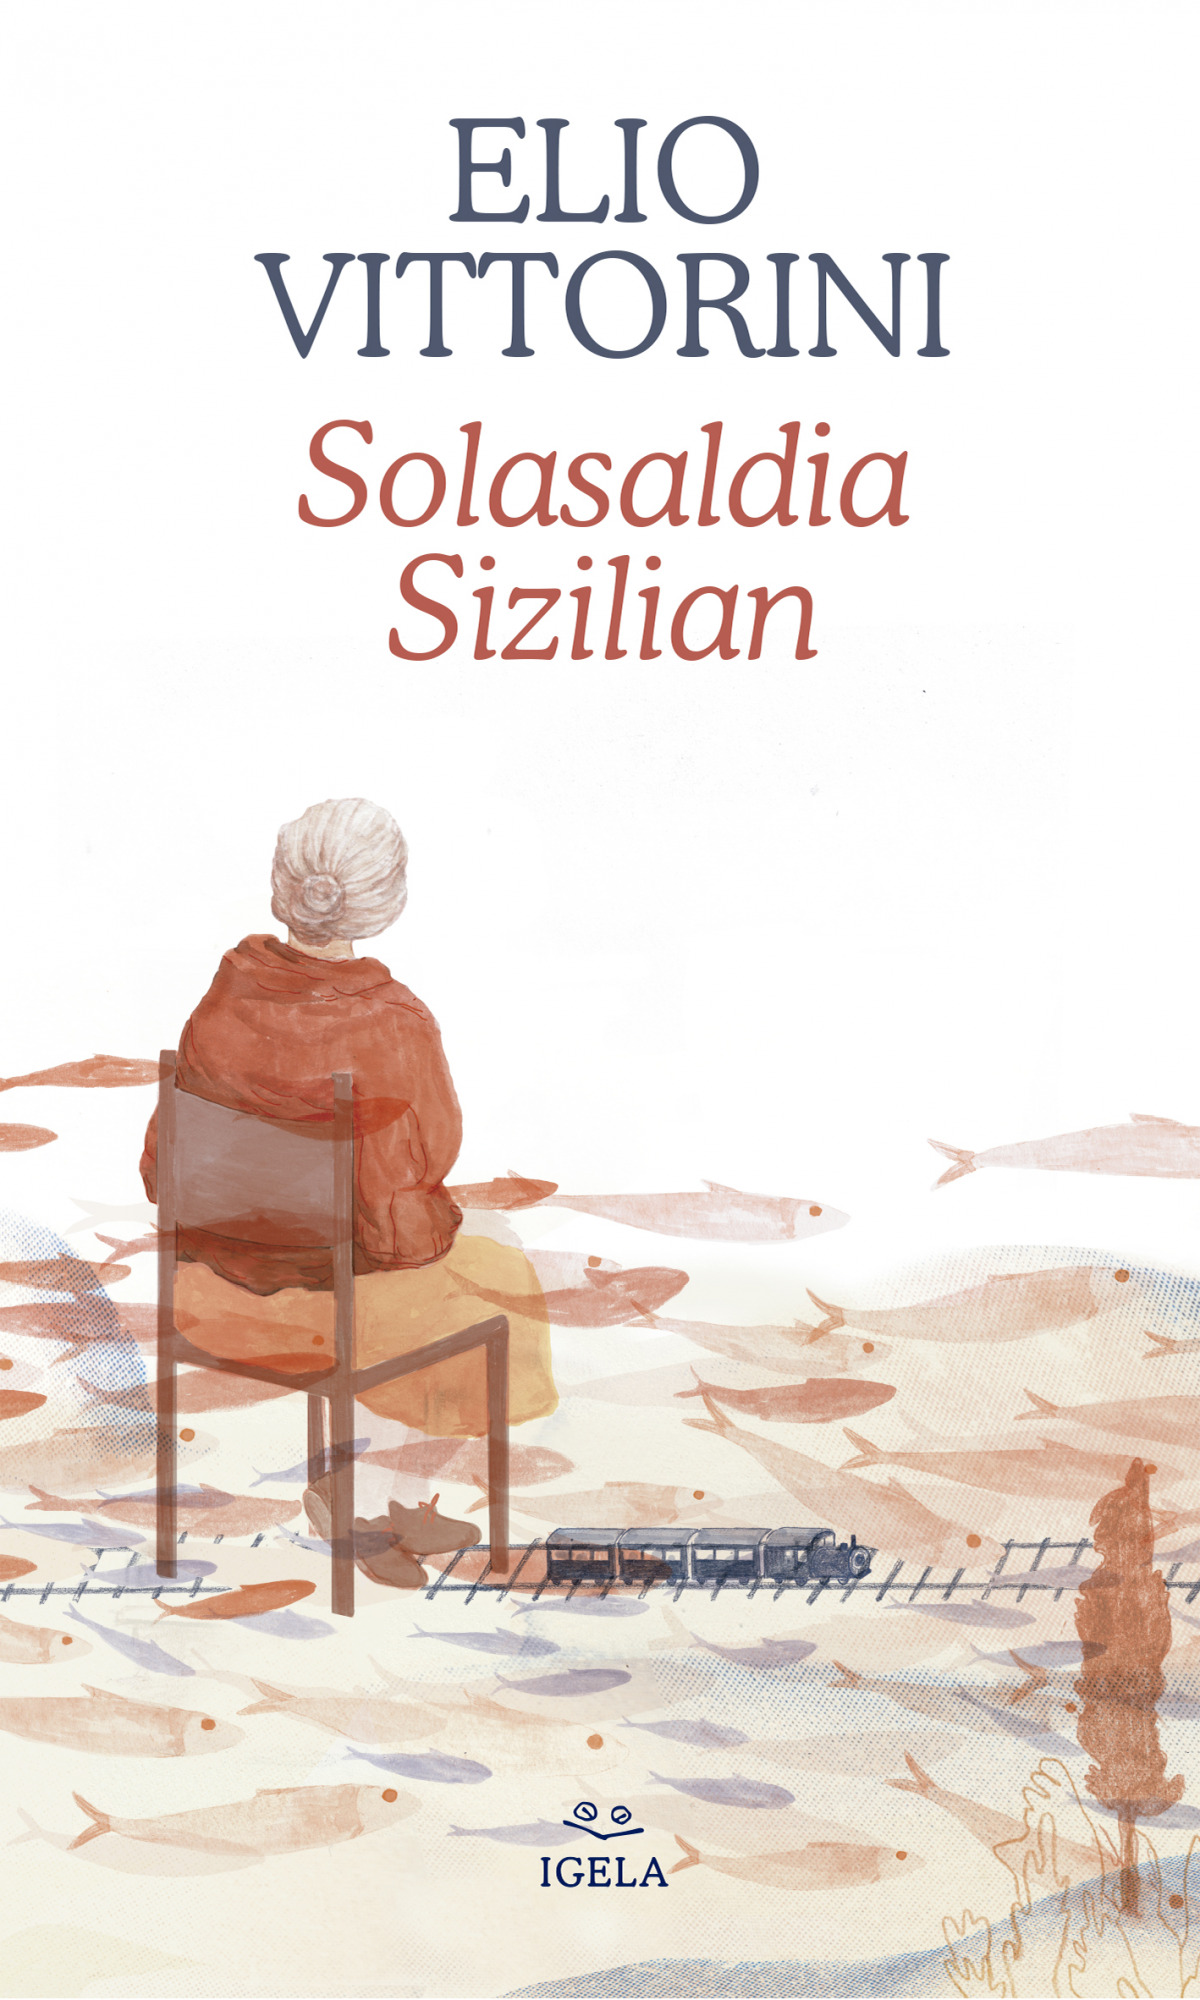 Solasaldia Sizilian